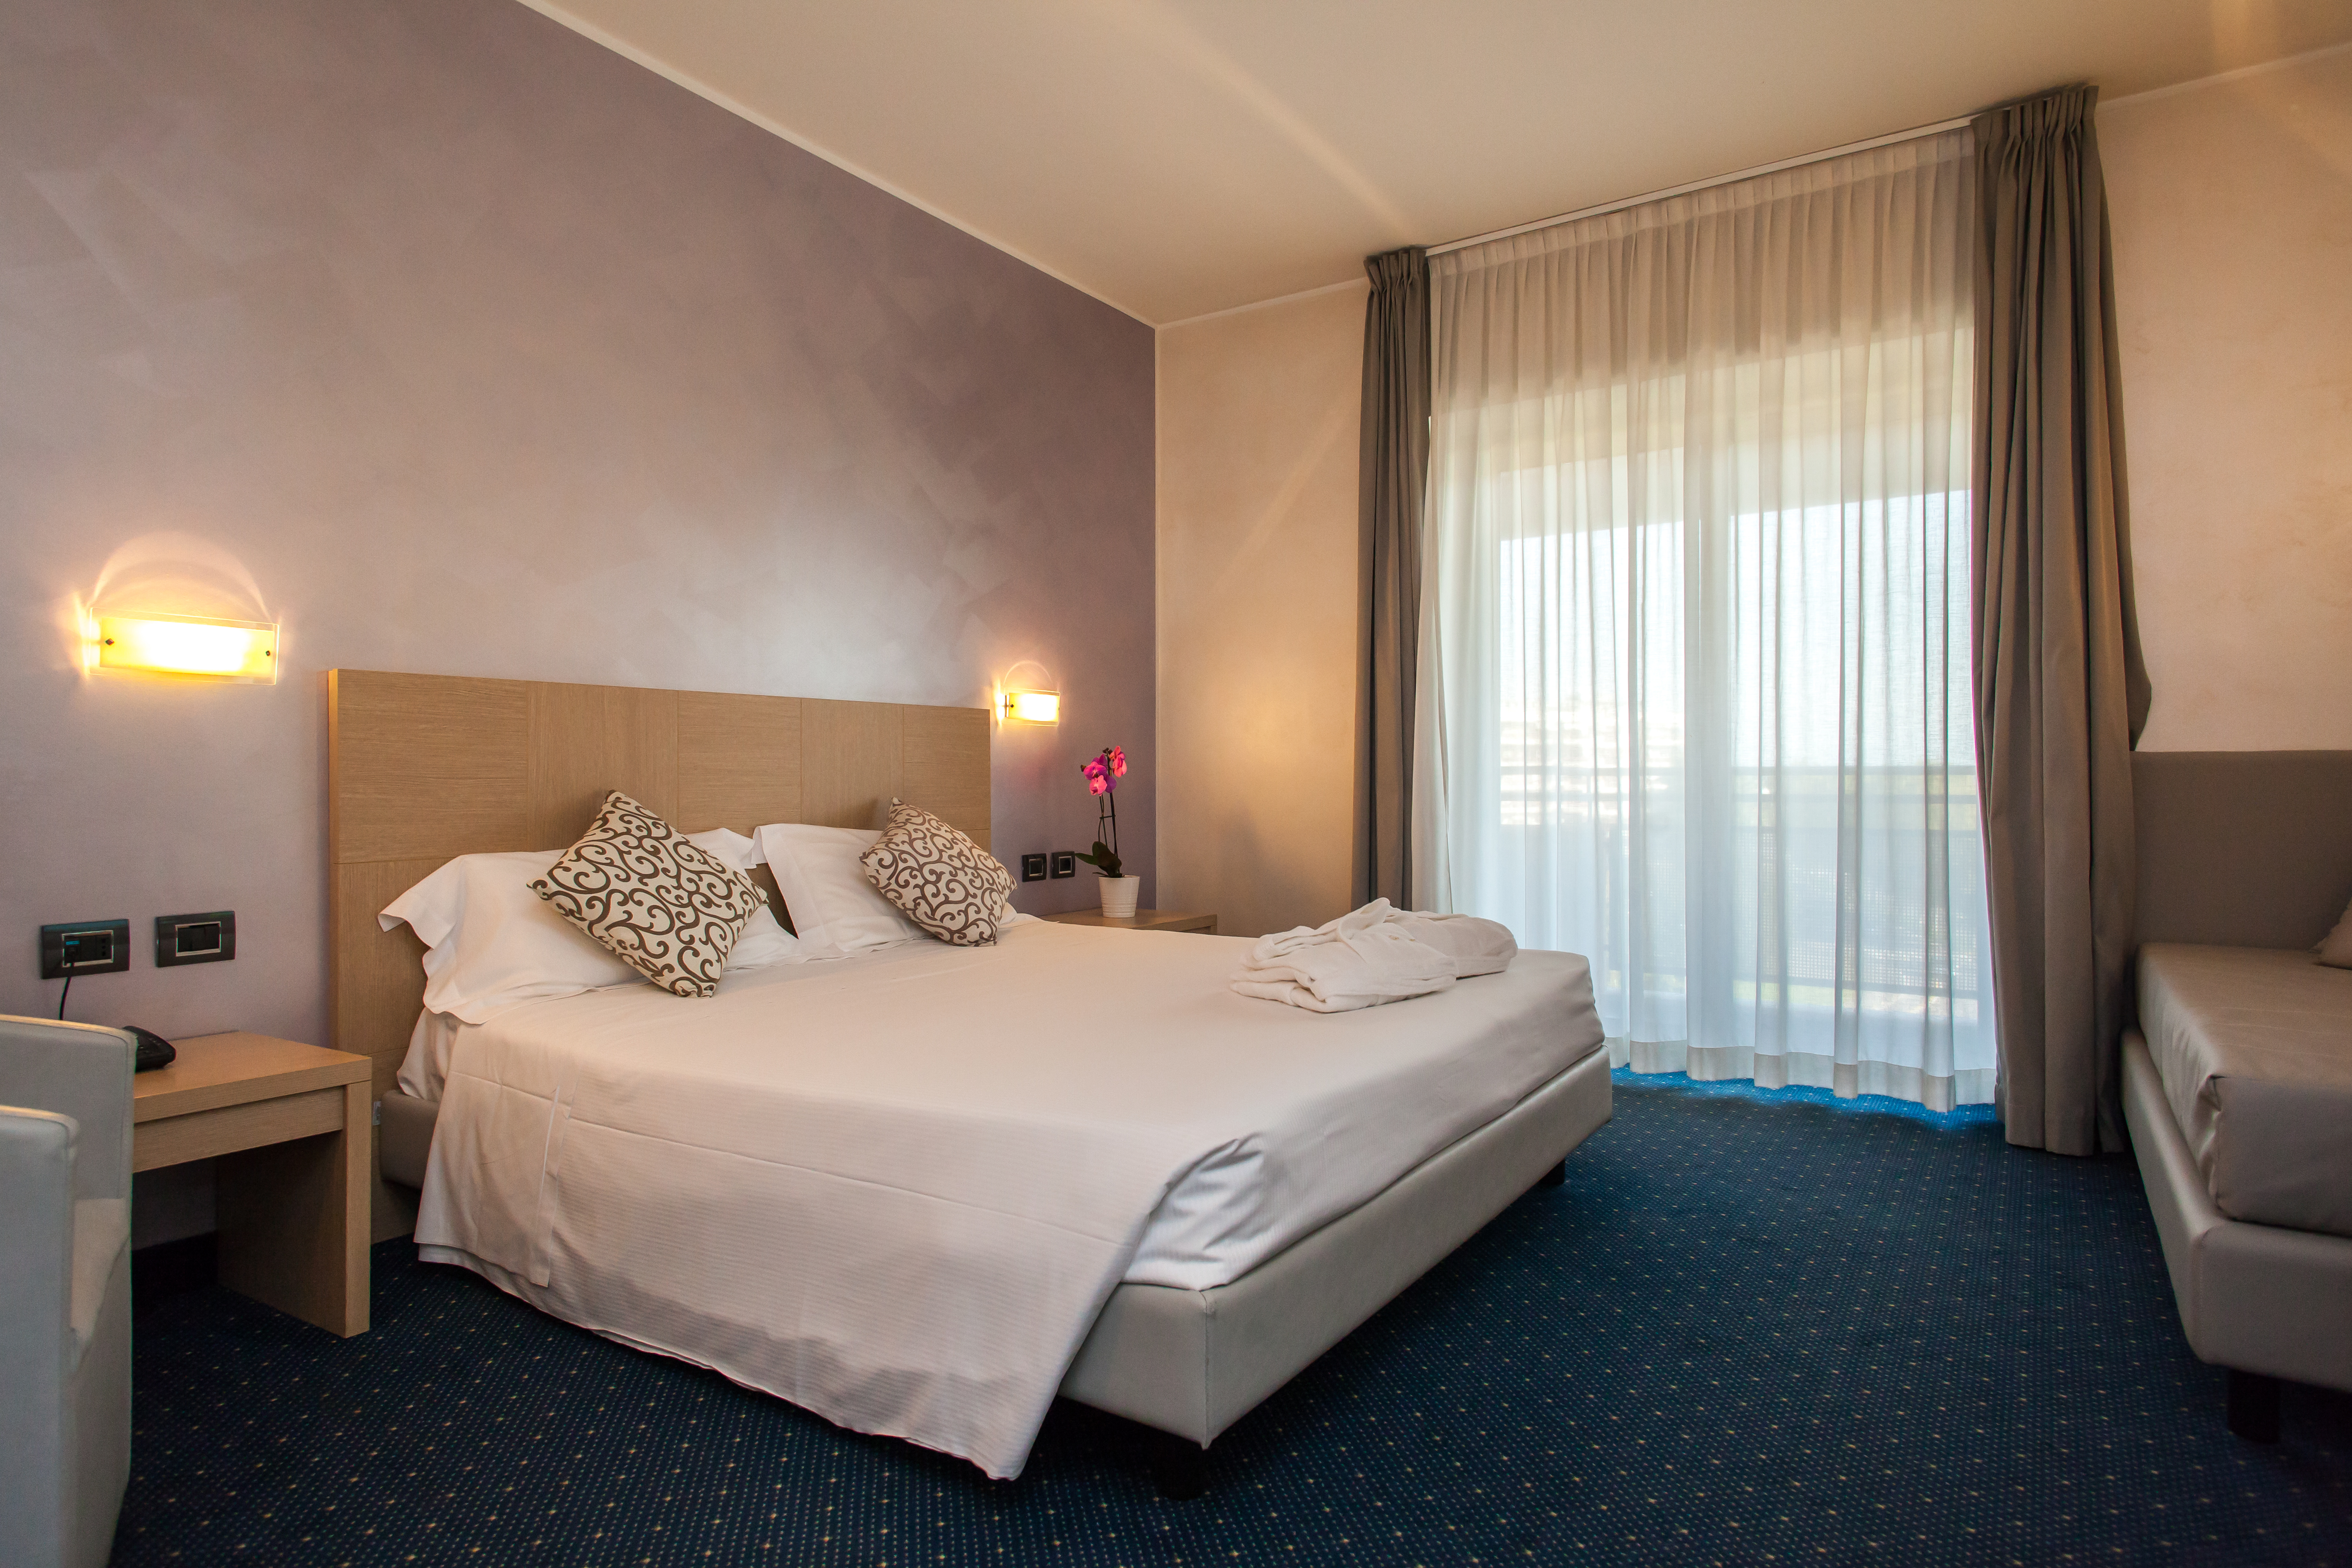 Palace_Hotel_006